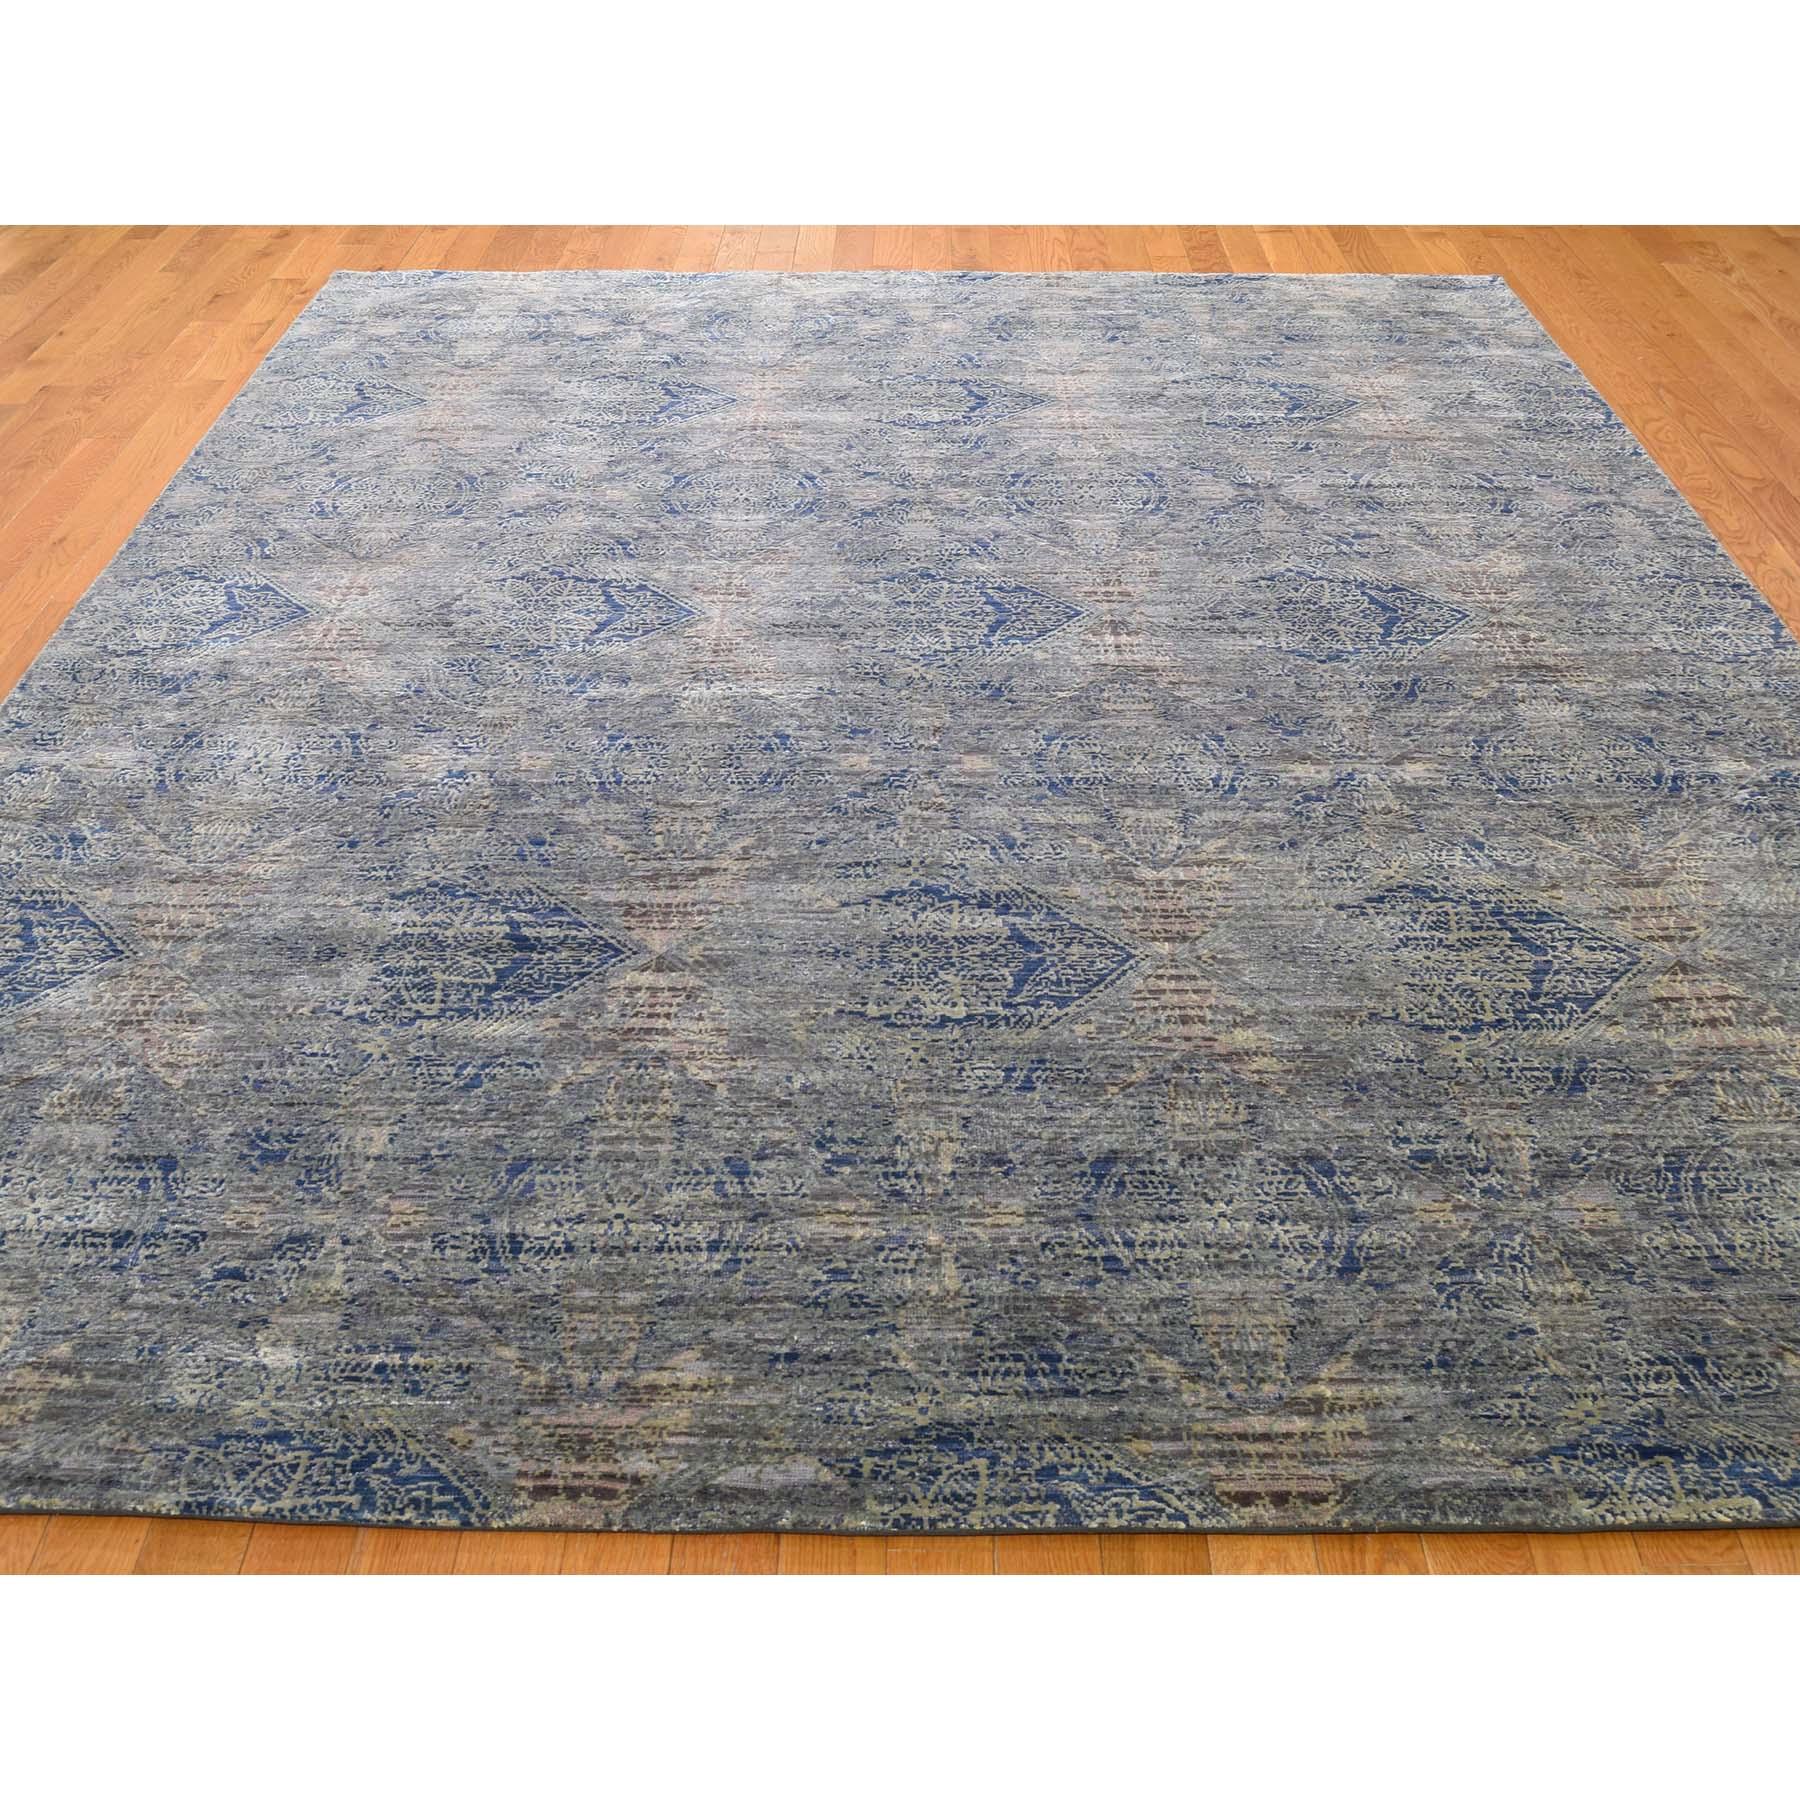 "8'x10'2"" ERASED ROSSETS,Silk With Textured Wool Denim BluE Hand-Knotted Oriental Rug"